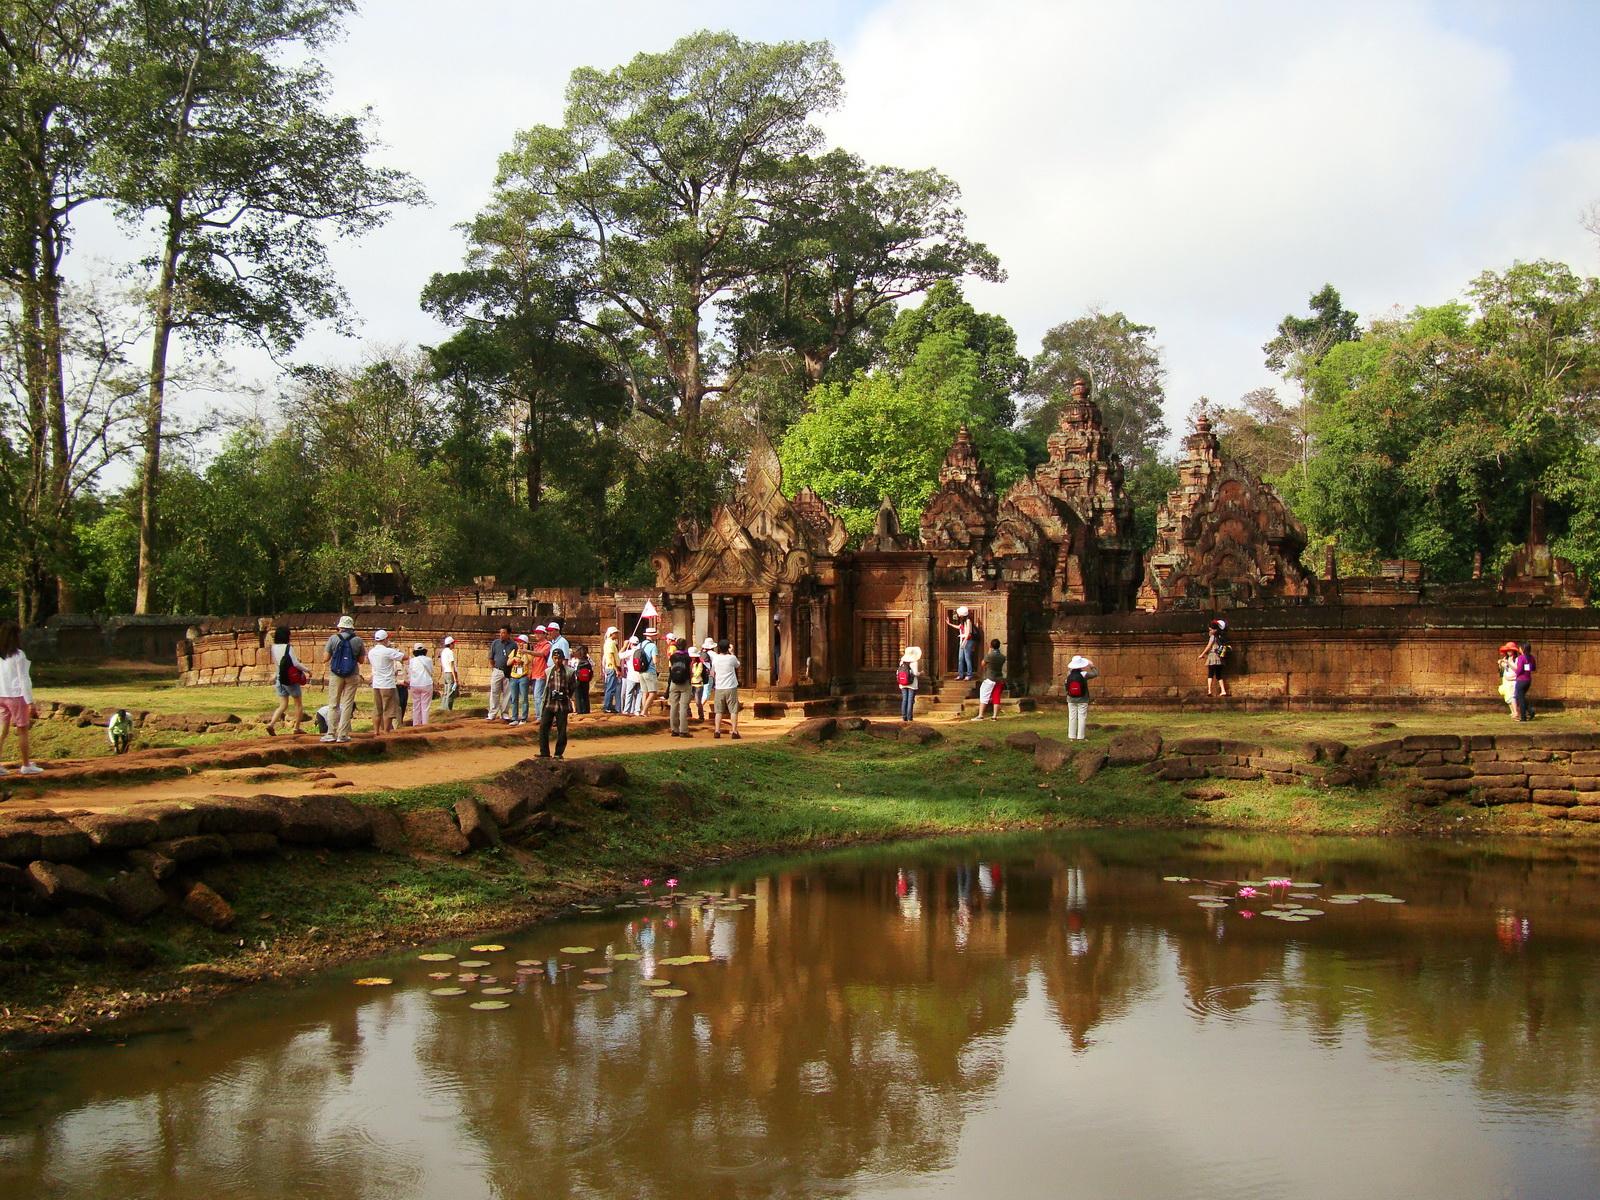 Banteay Srei 10th century Khmer architecture Tribhuvanamahesvara 20